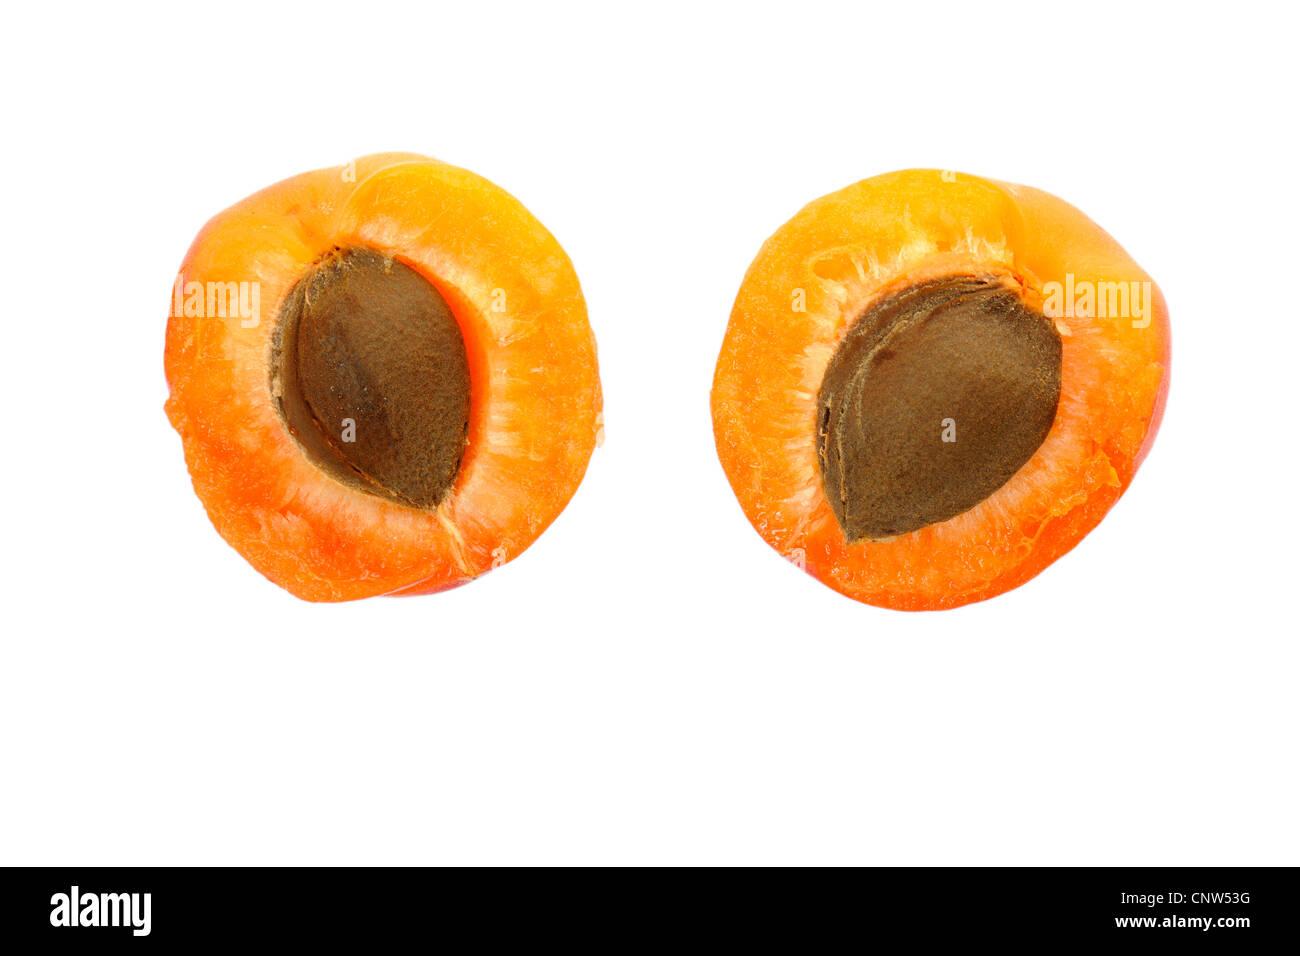 apricot tree (Prunus armeniaca), cut apricots - Stock Image